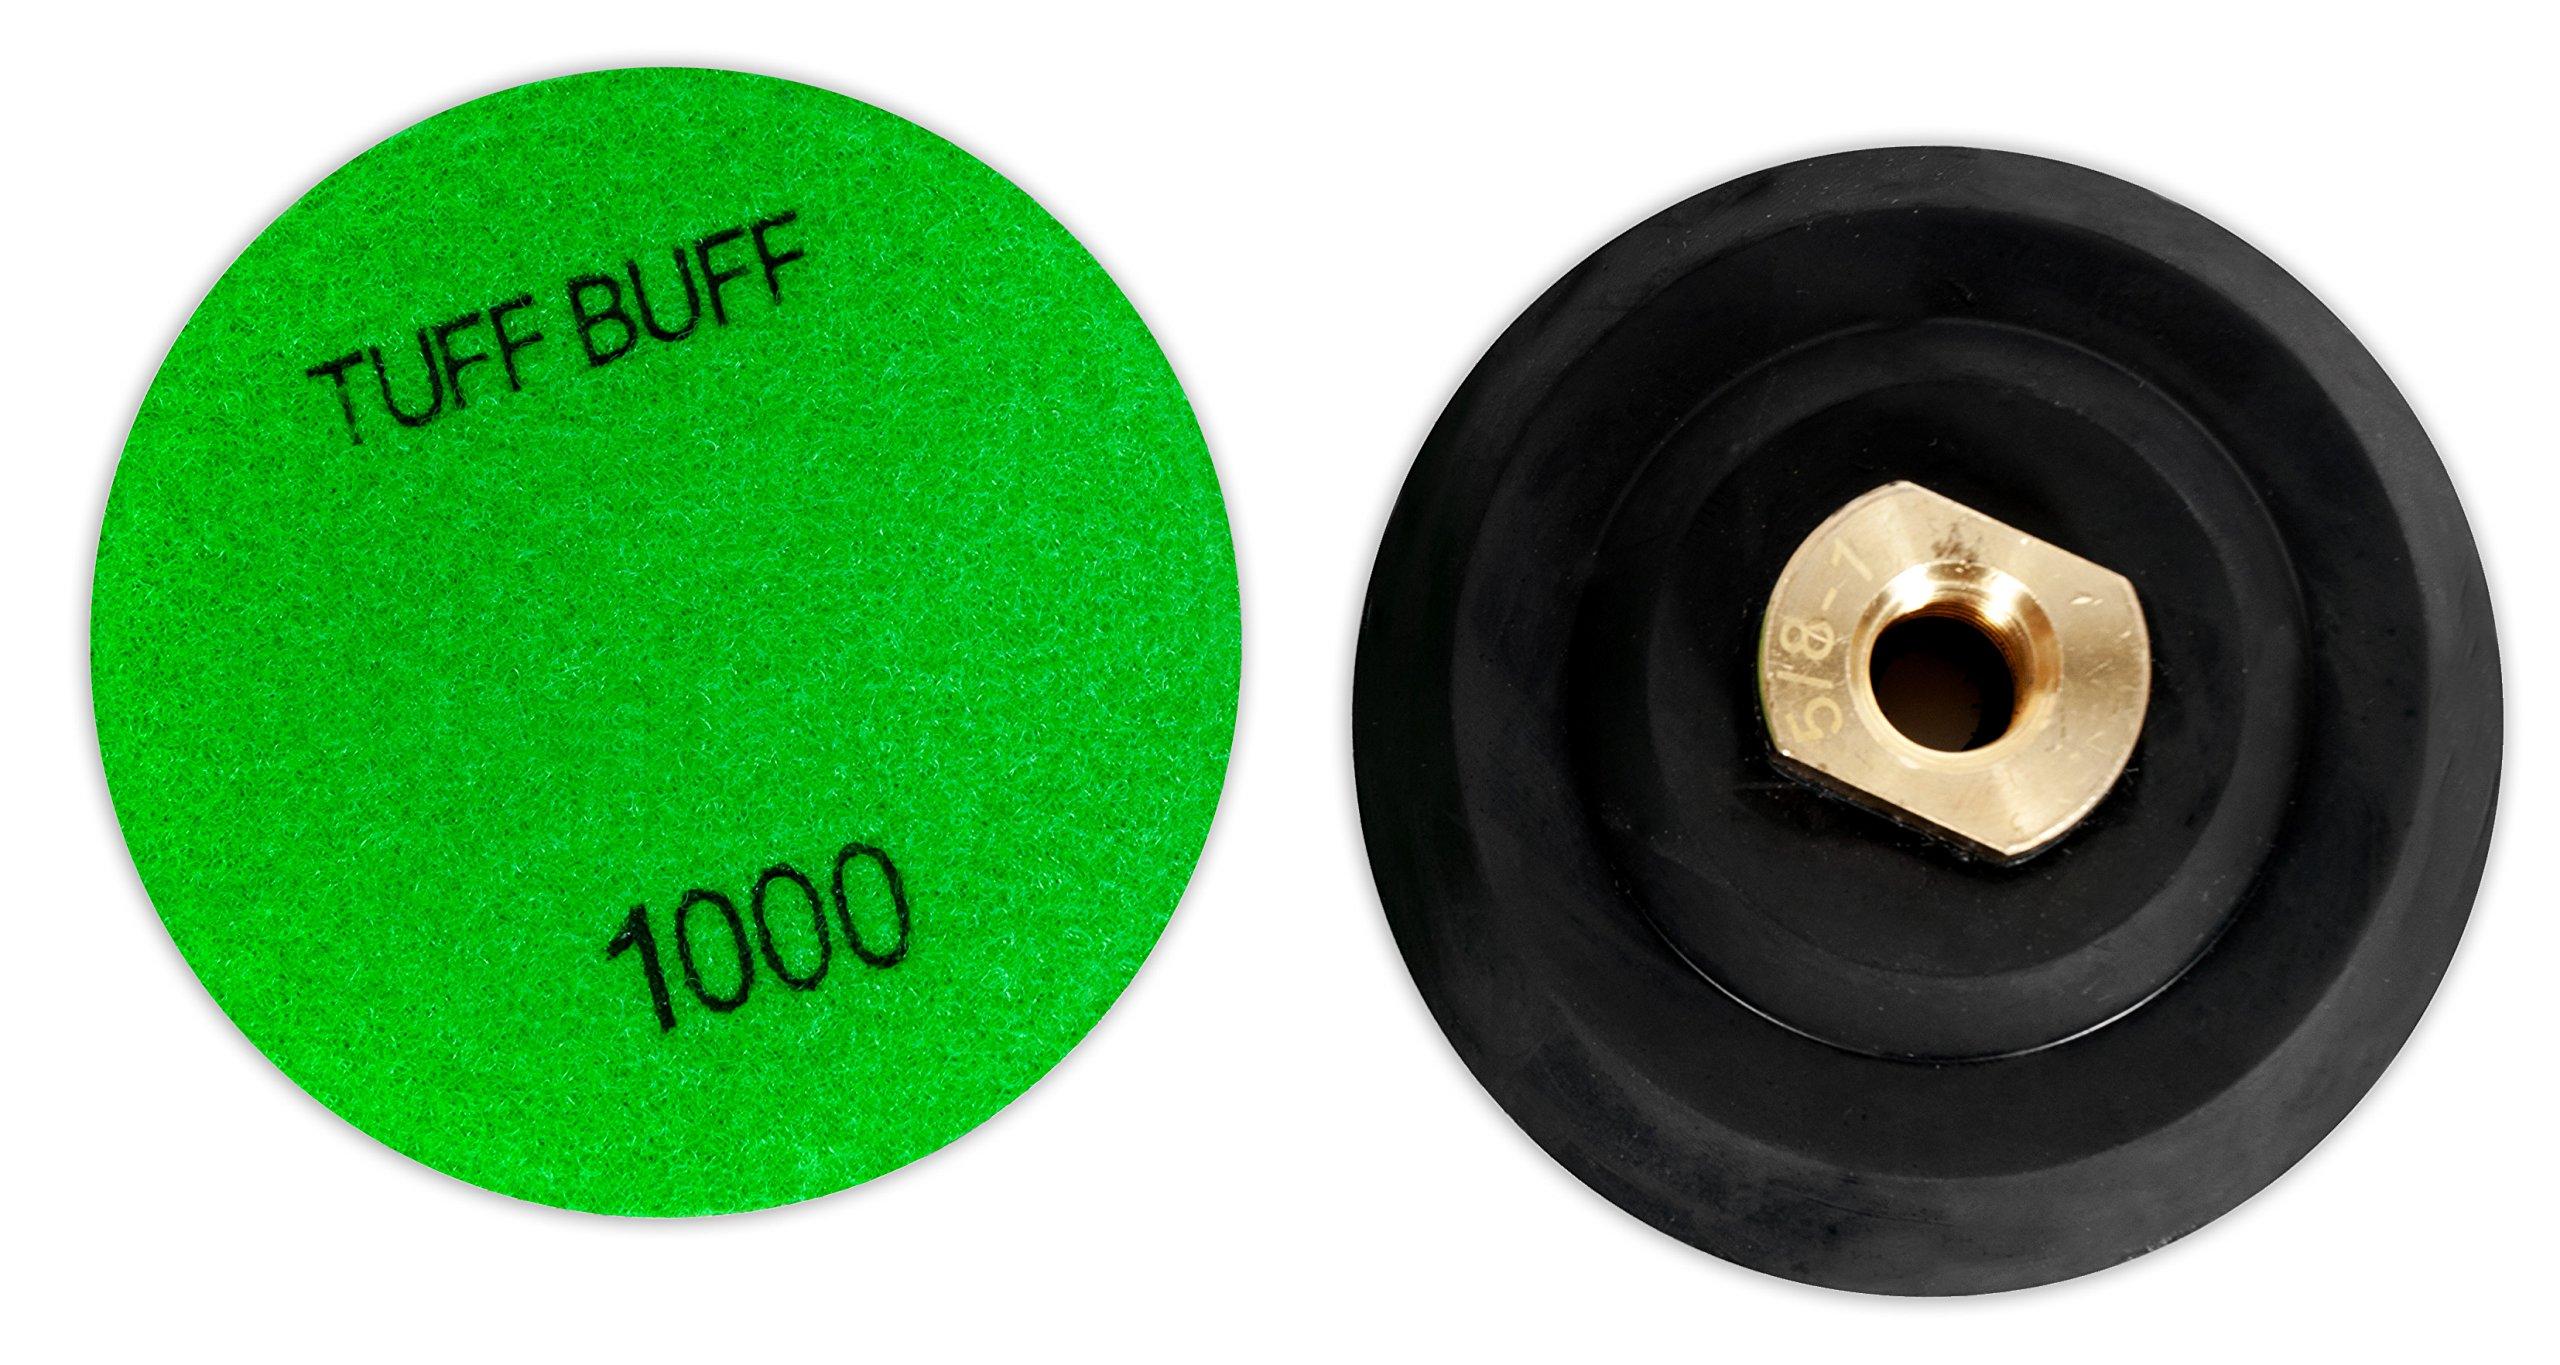 TUFF BUFF - Wet/Dry Diamond Polishing Pads - 11 Piece Set with Rubber Backer for Granite, Stone, Concrete, Marble, Travertine, Terrazzo- 4'' Inch Pads by Tuff Buff (Image #6)